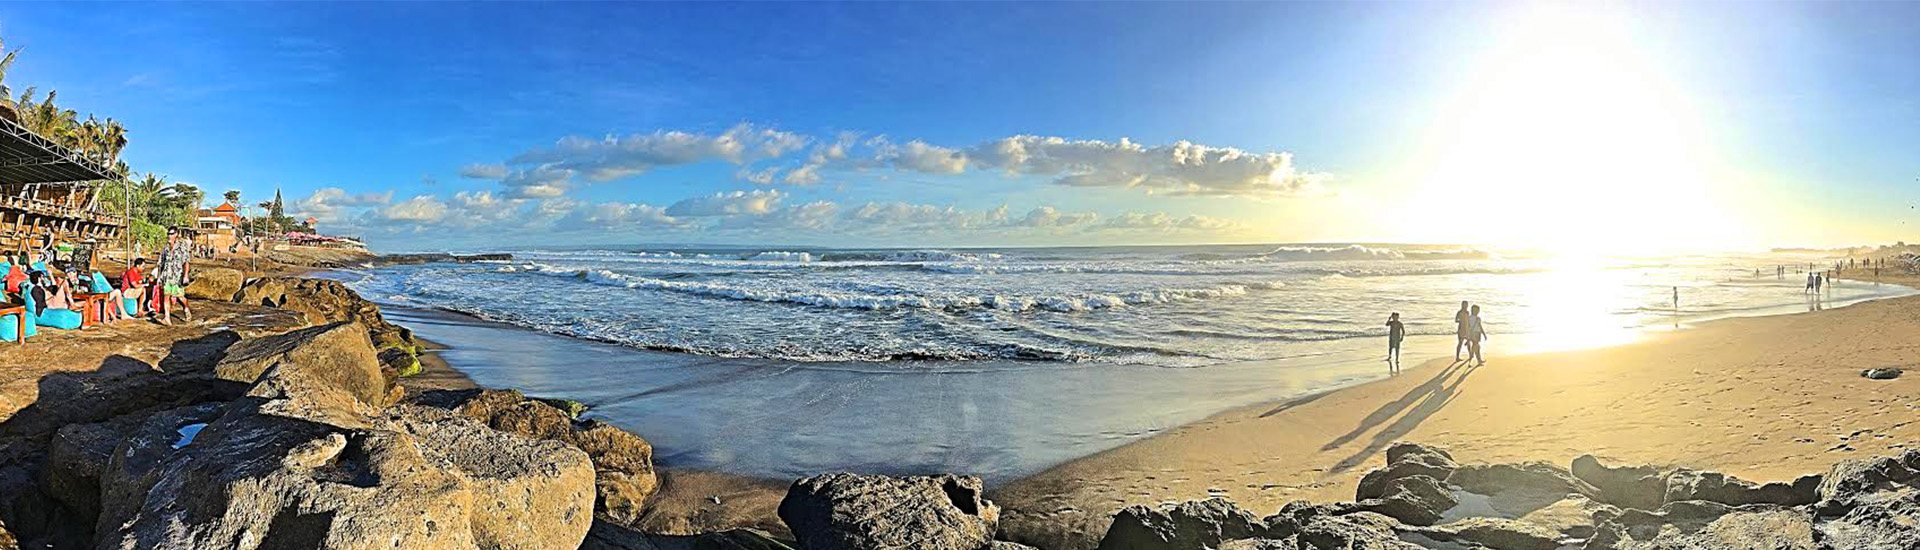 Searching the perfect wave: Canggu, Bali 2016